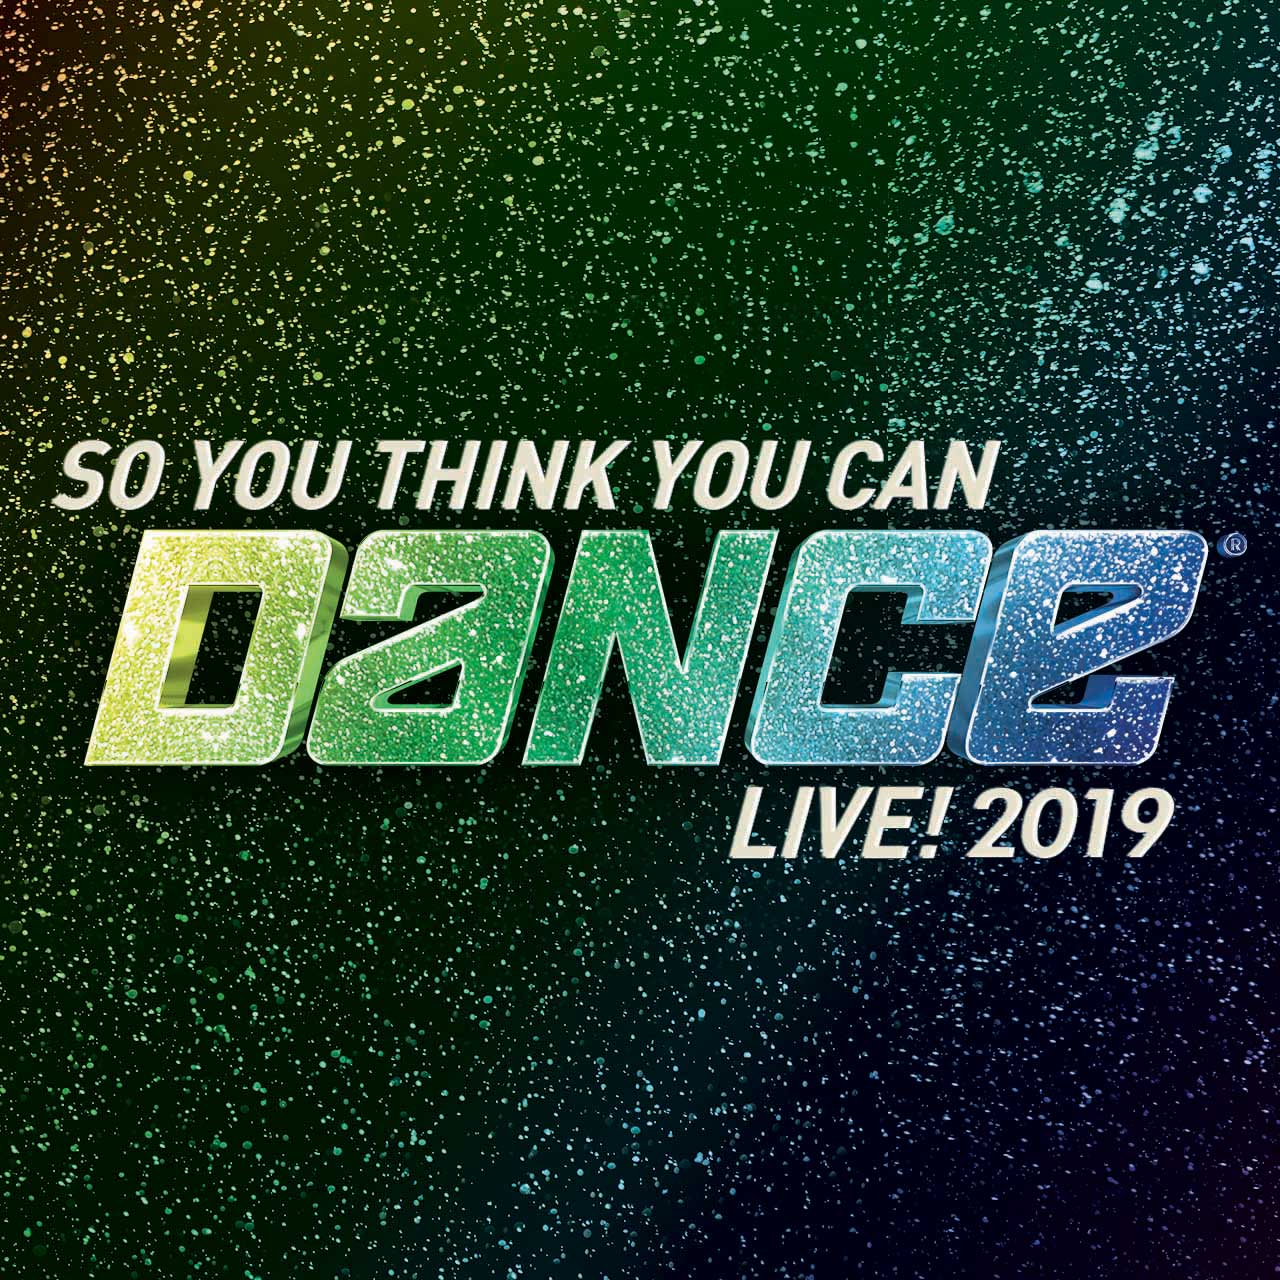 LIVE! 2019